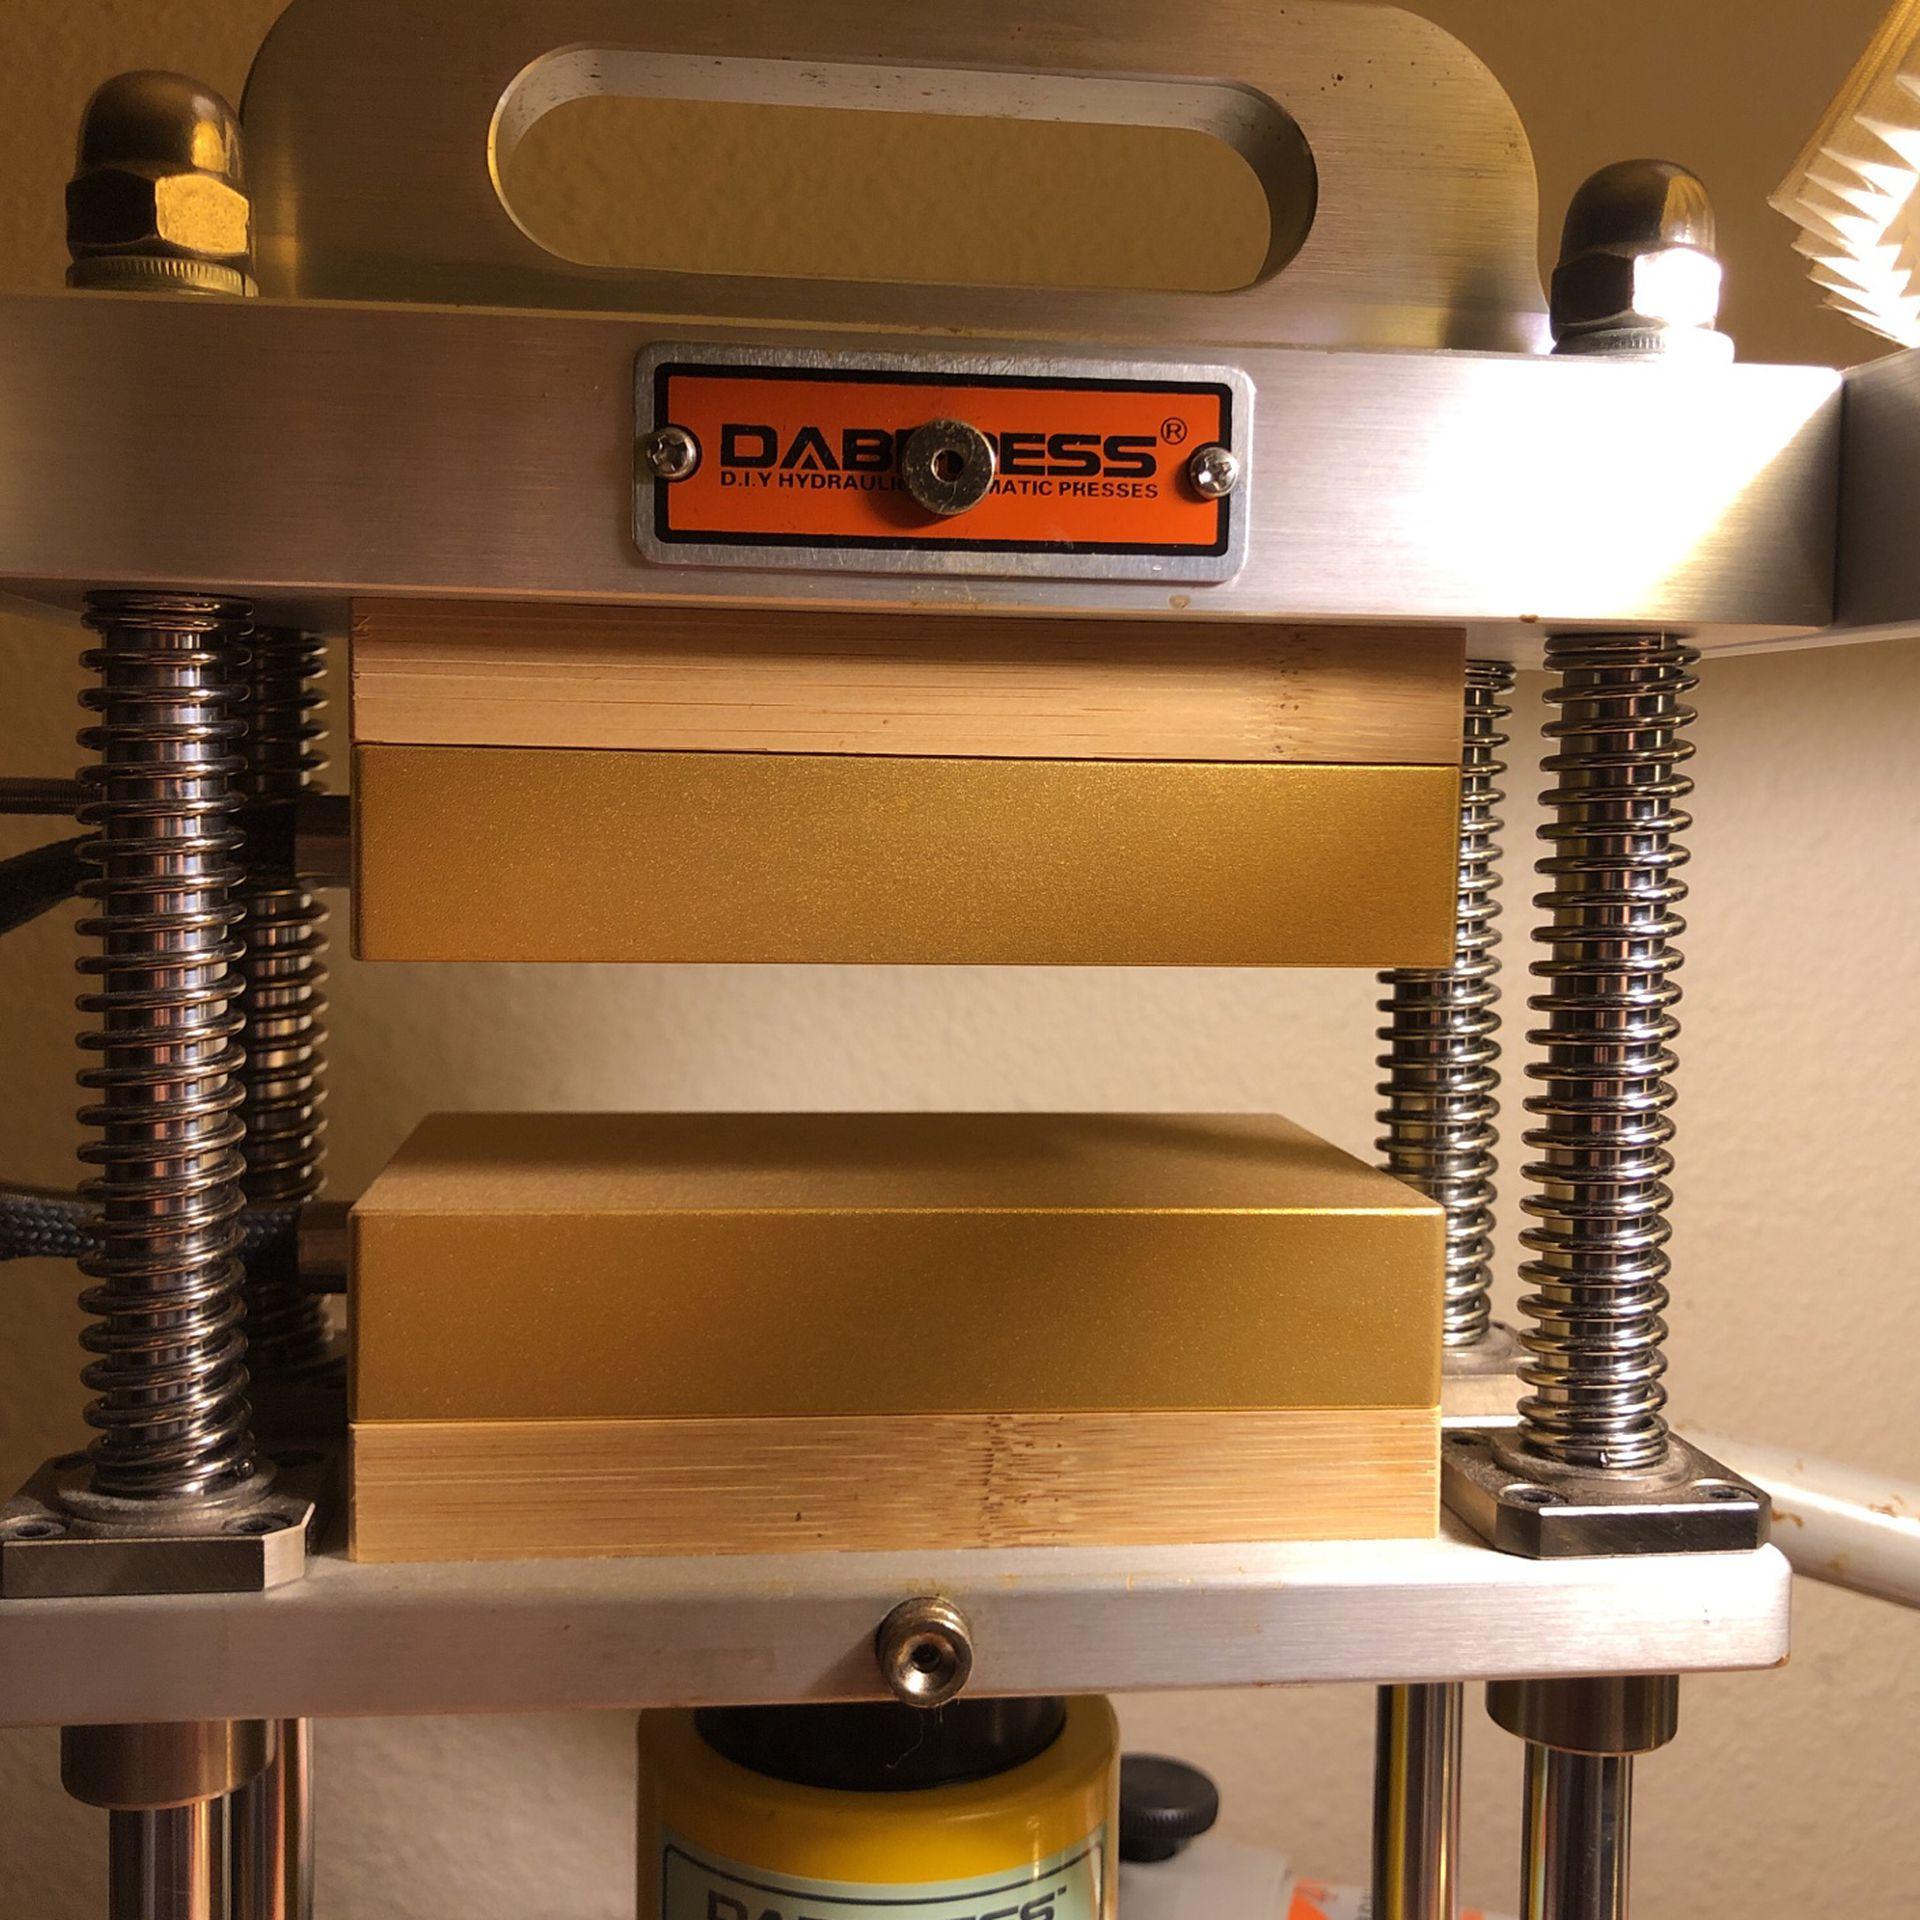 10 Ton Dabpress With Hand Pump Like New